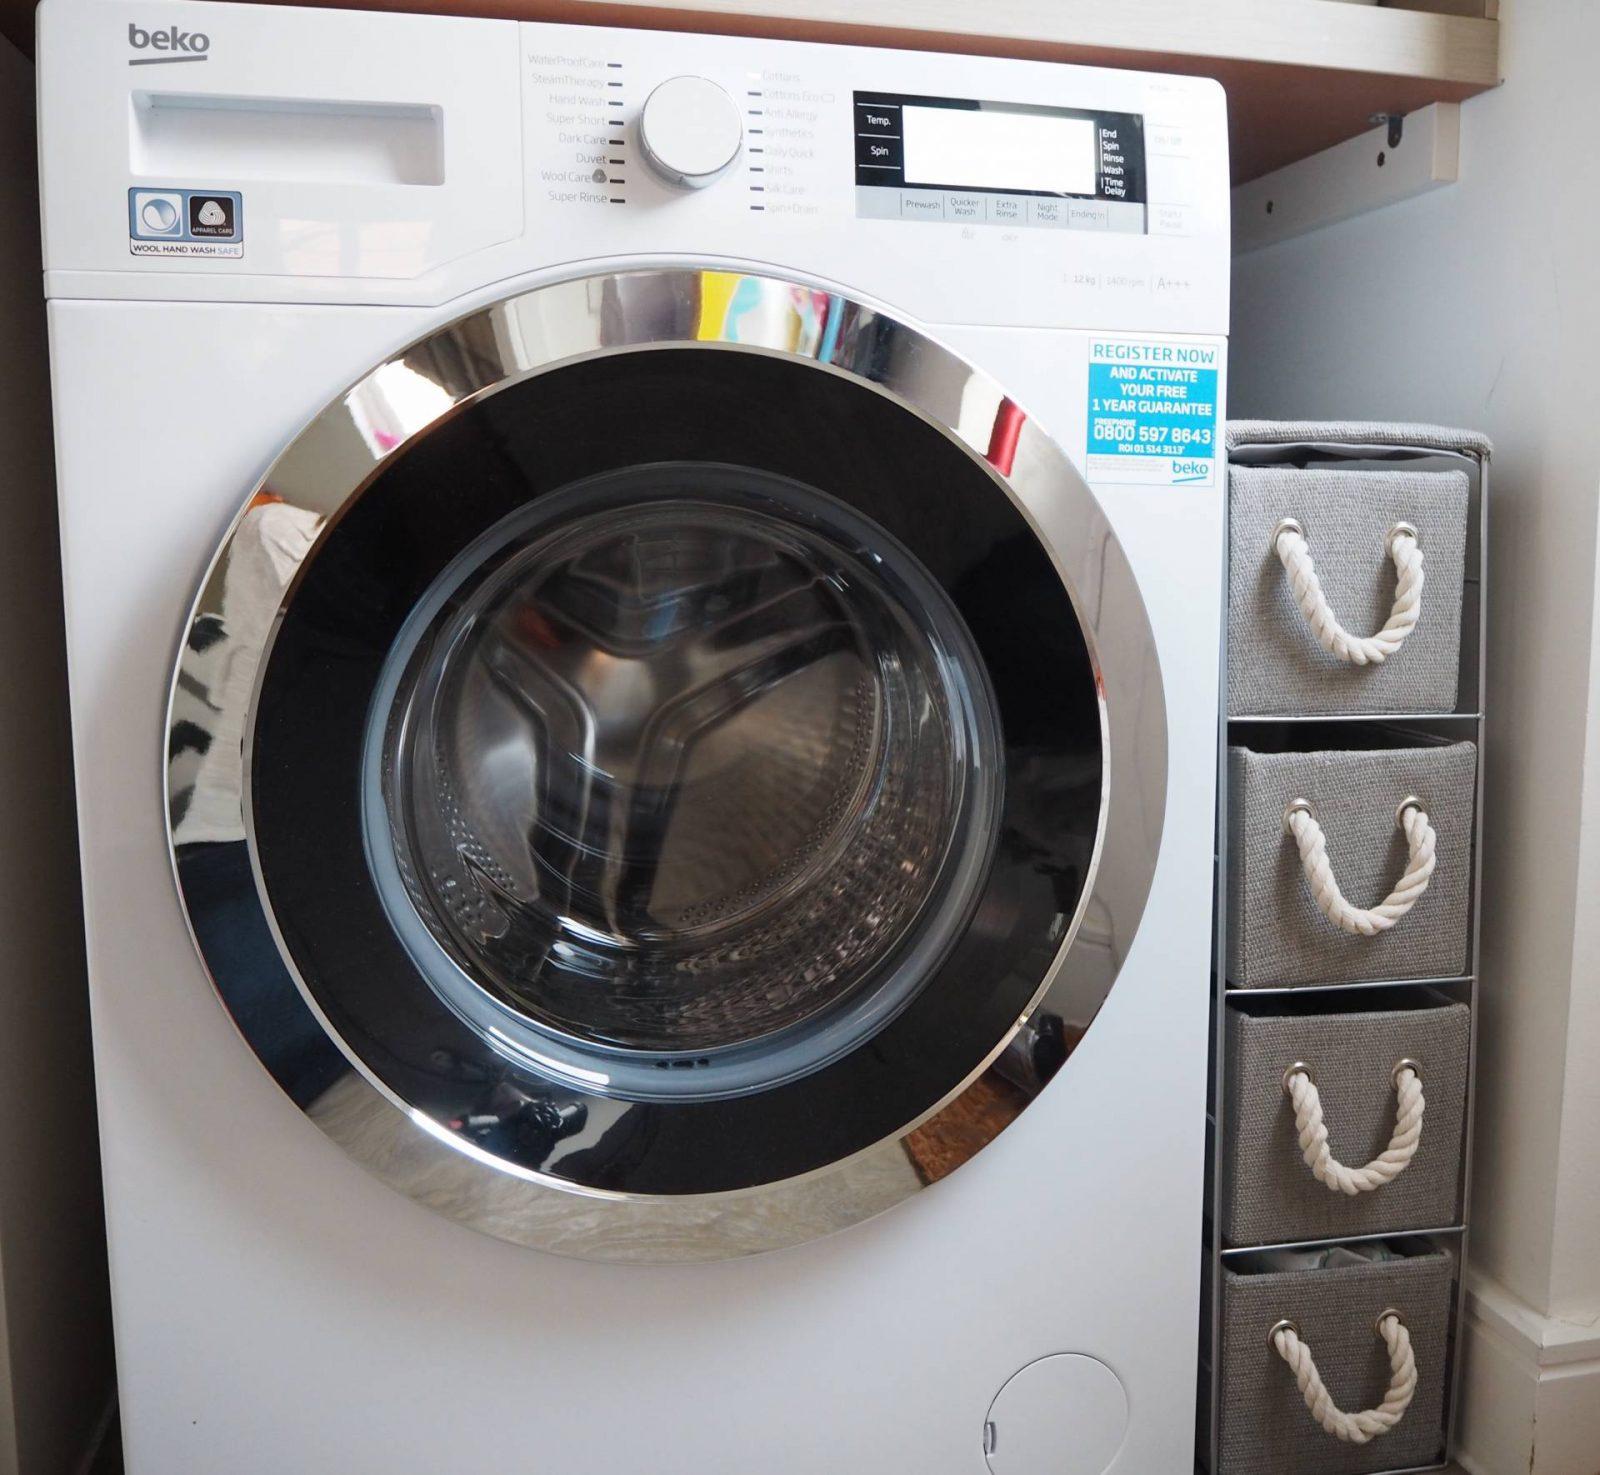 Beko Freestanding 12kg Washing Machine…My Thoughts!